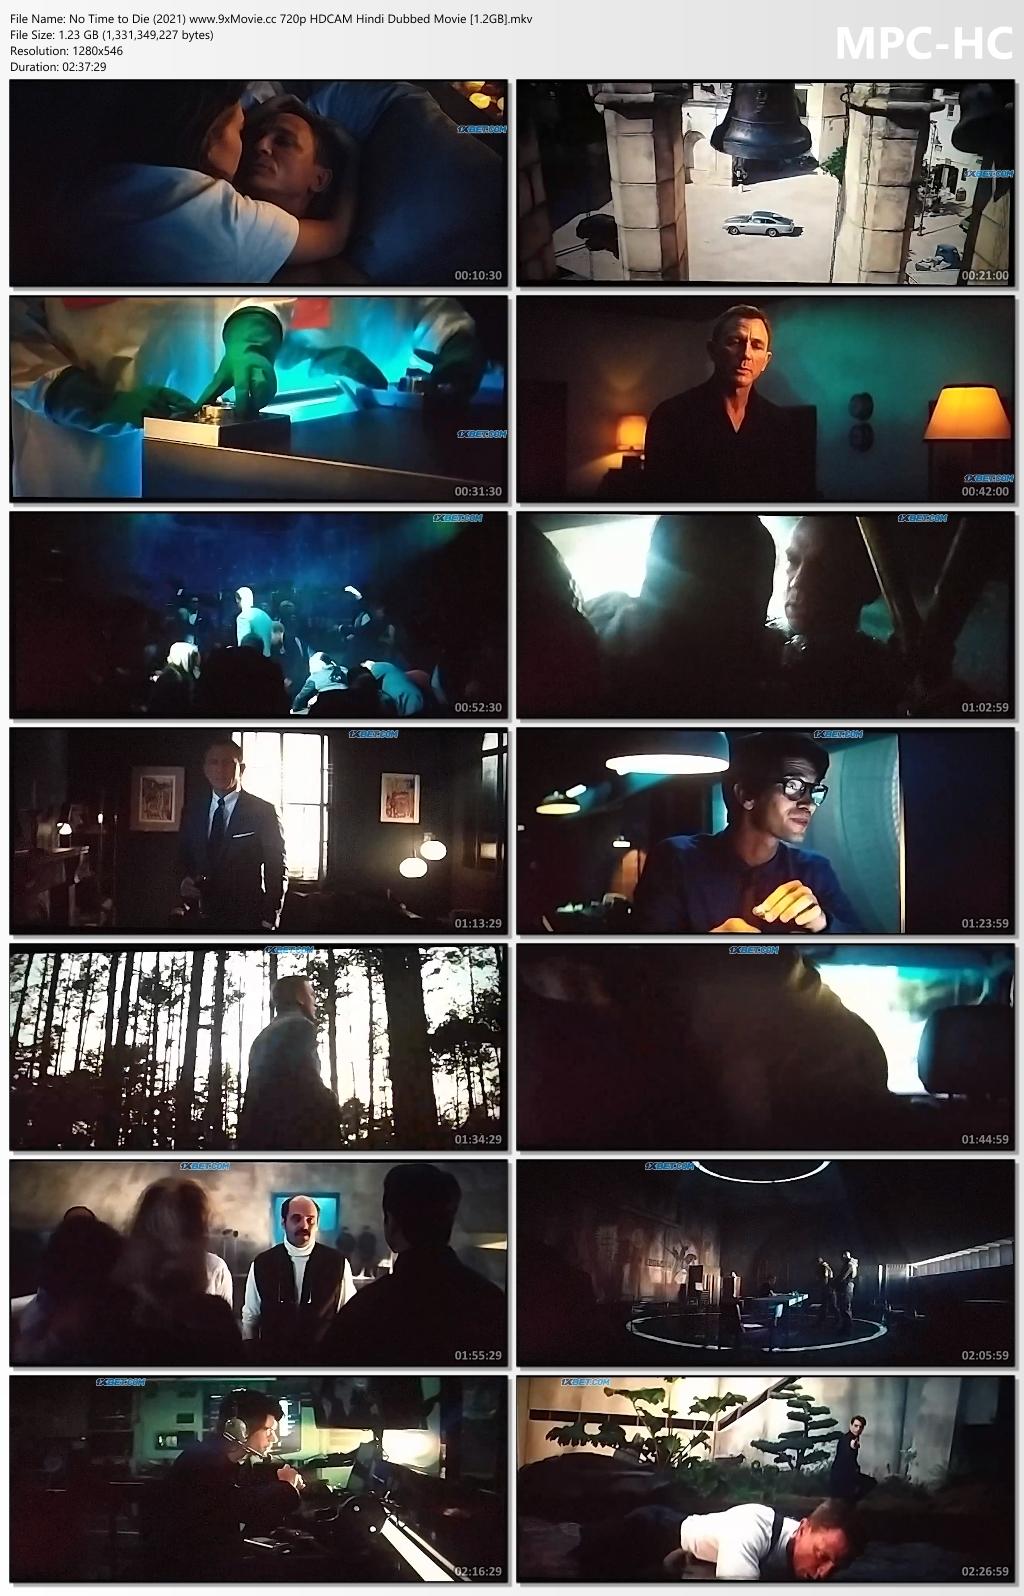 No-Time-to-Die-2021-www-9x-Movie-cc-720p-HDCAM-Hindi-Dubbed-Movie-1-2-GB-mkv